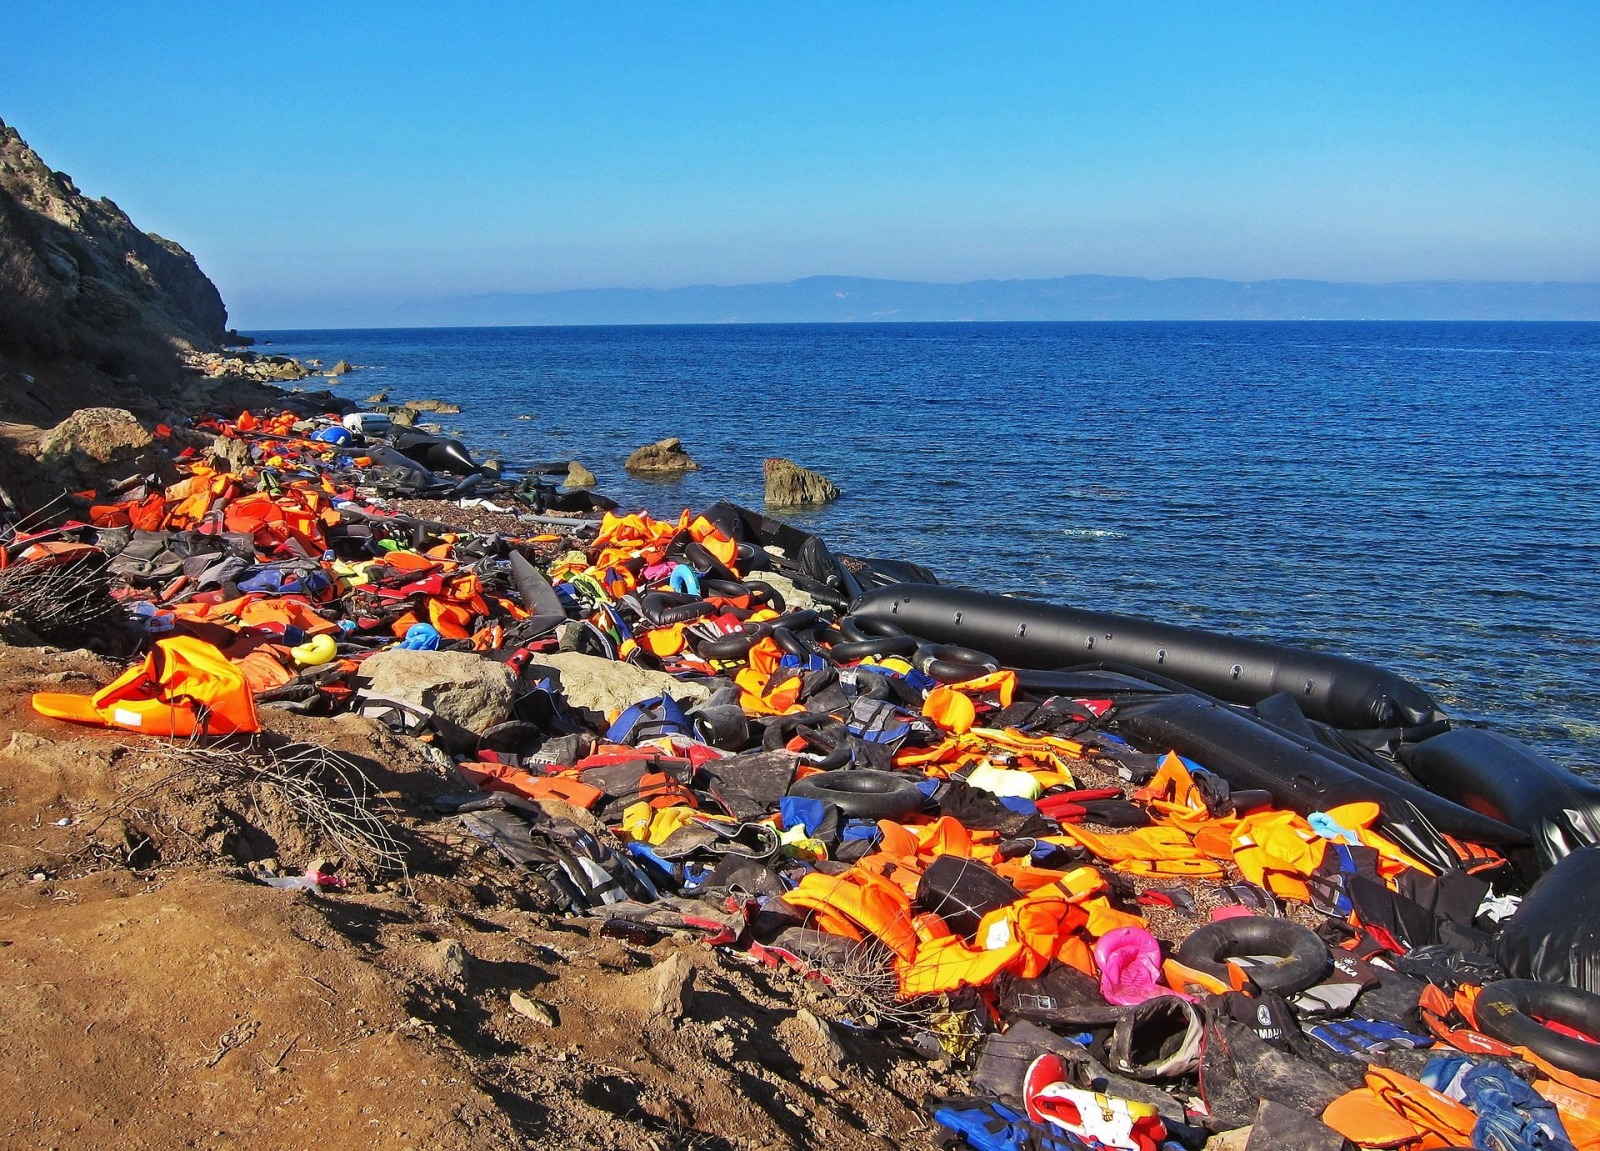 schwimmwesten strand fluechtlinge life jackets Jim Black pixabay